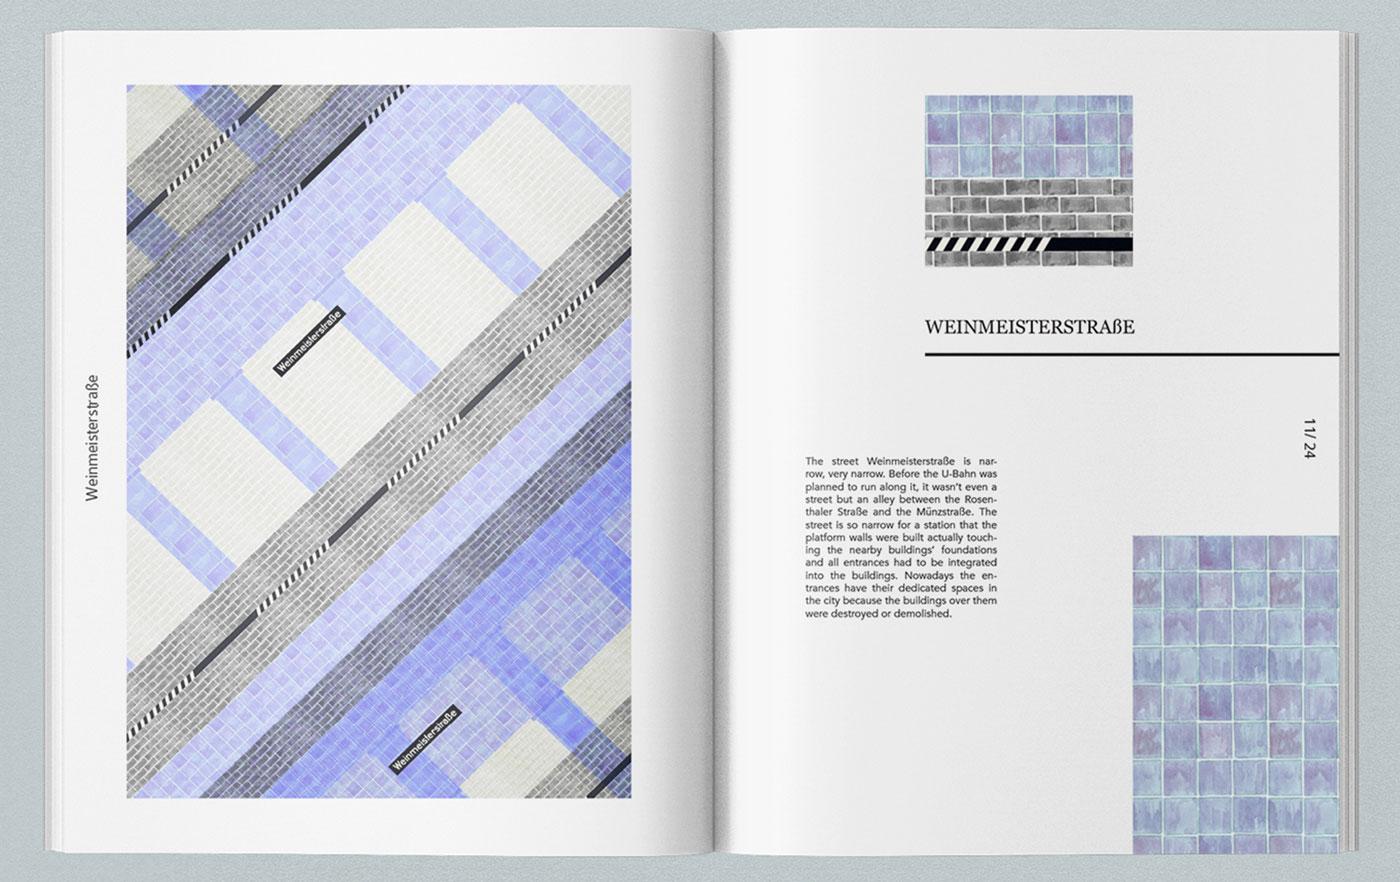 magazine_insides_pages-mockup-5.jpg